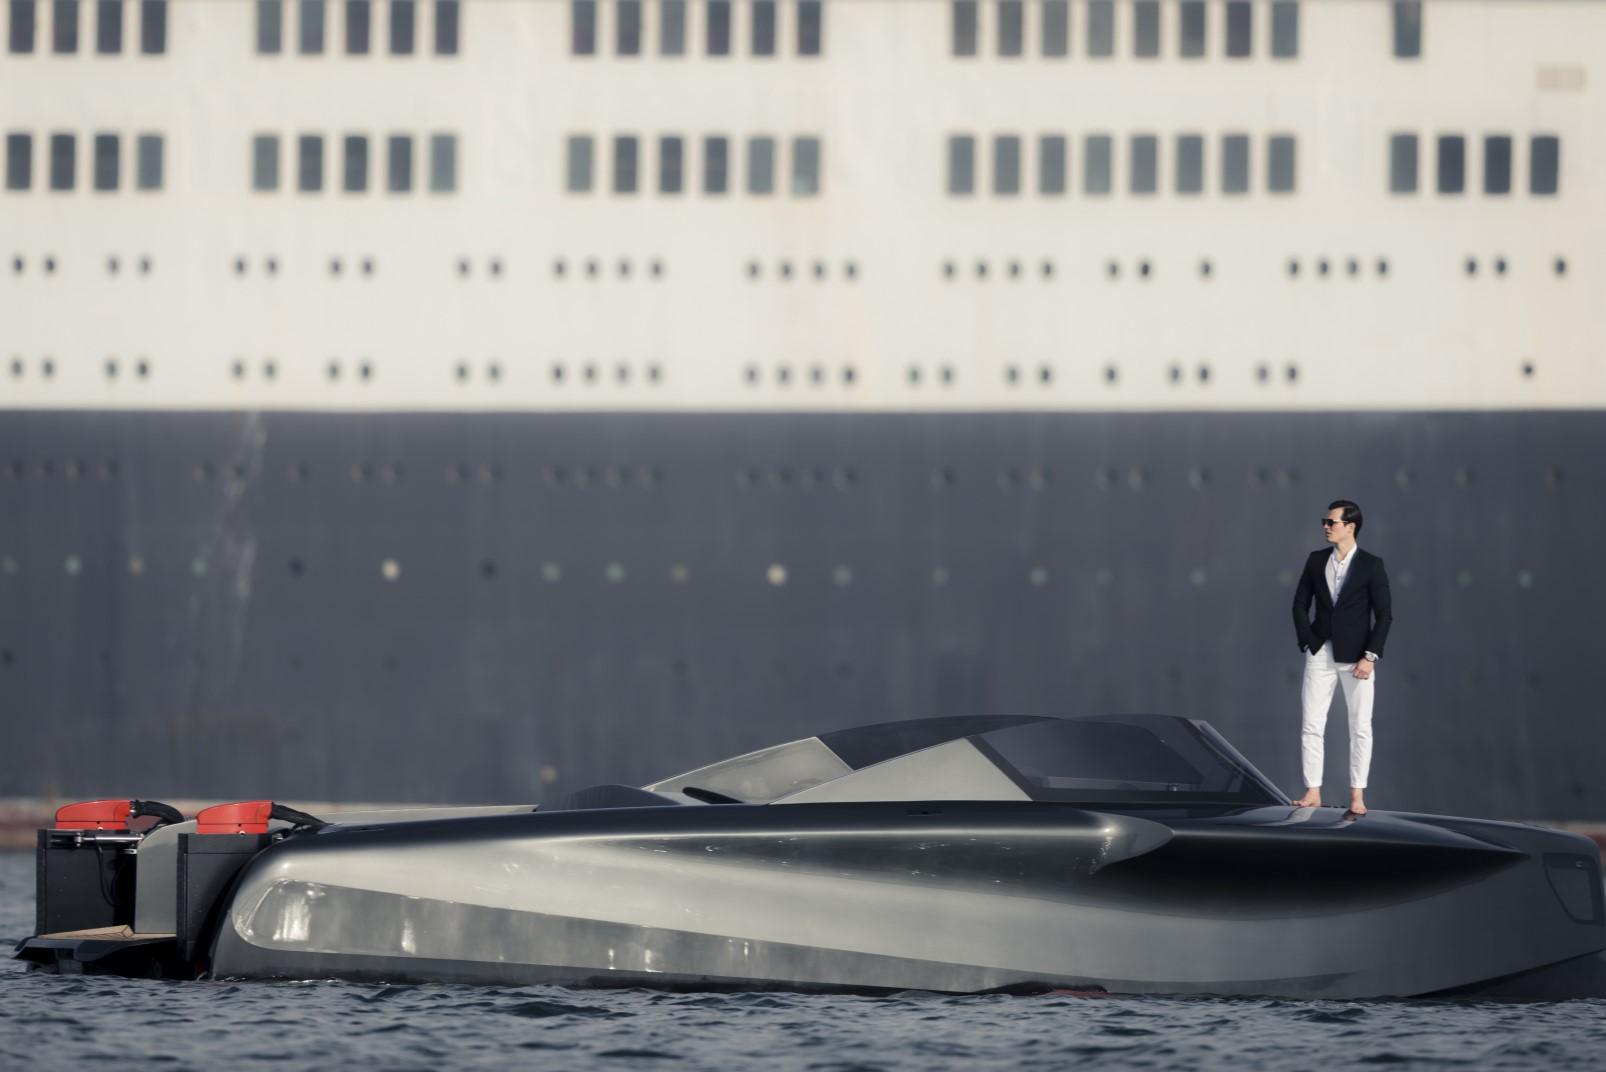 Foiler by Enata Marine futuristic lines